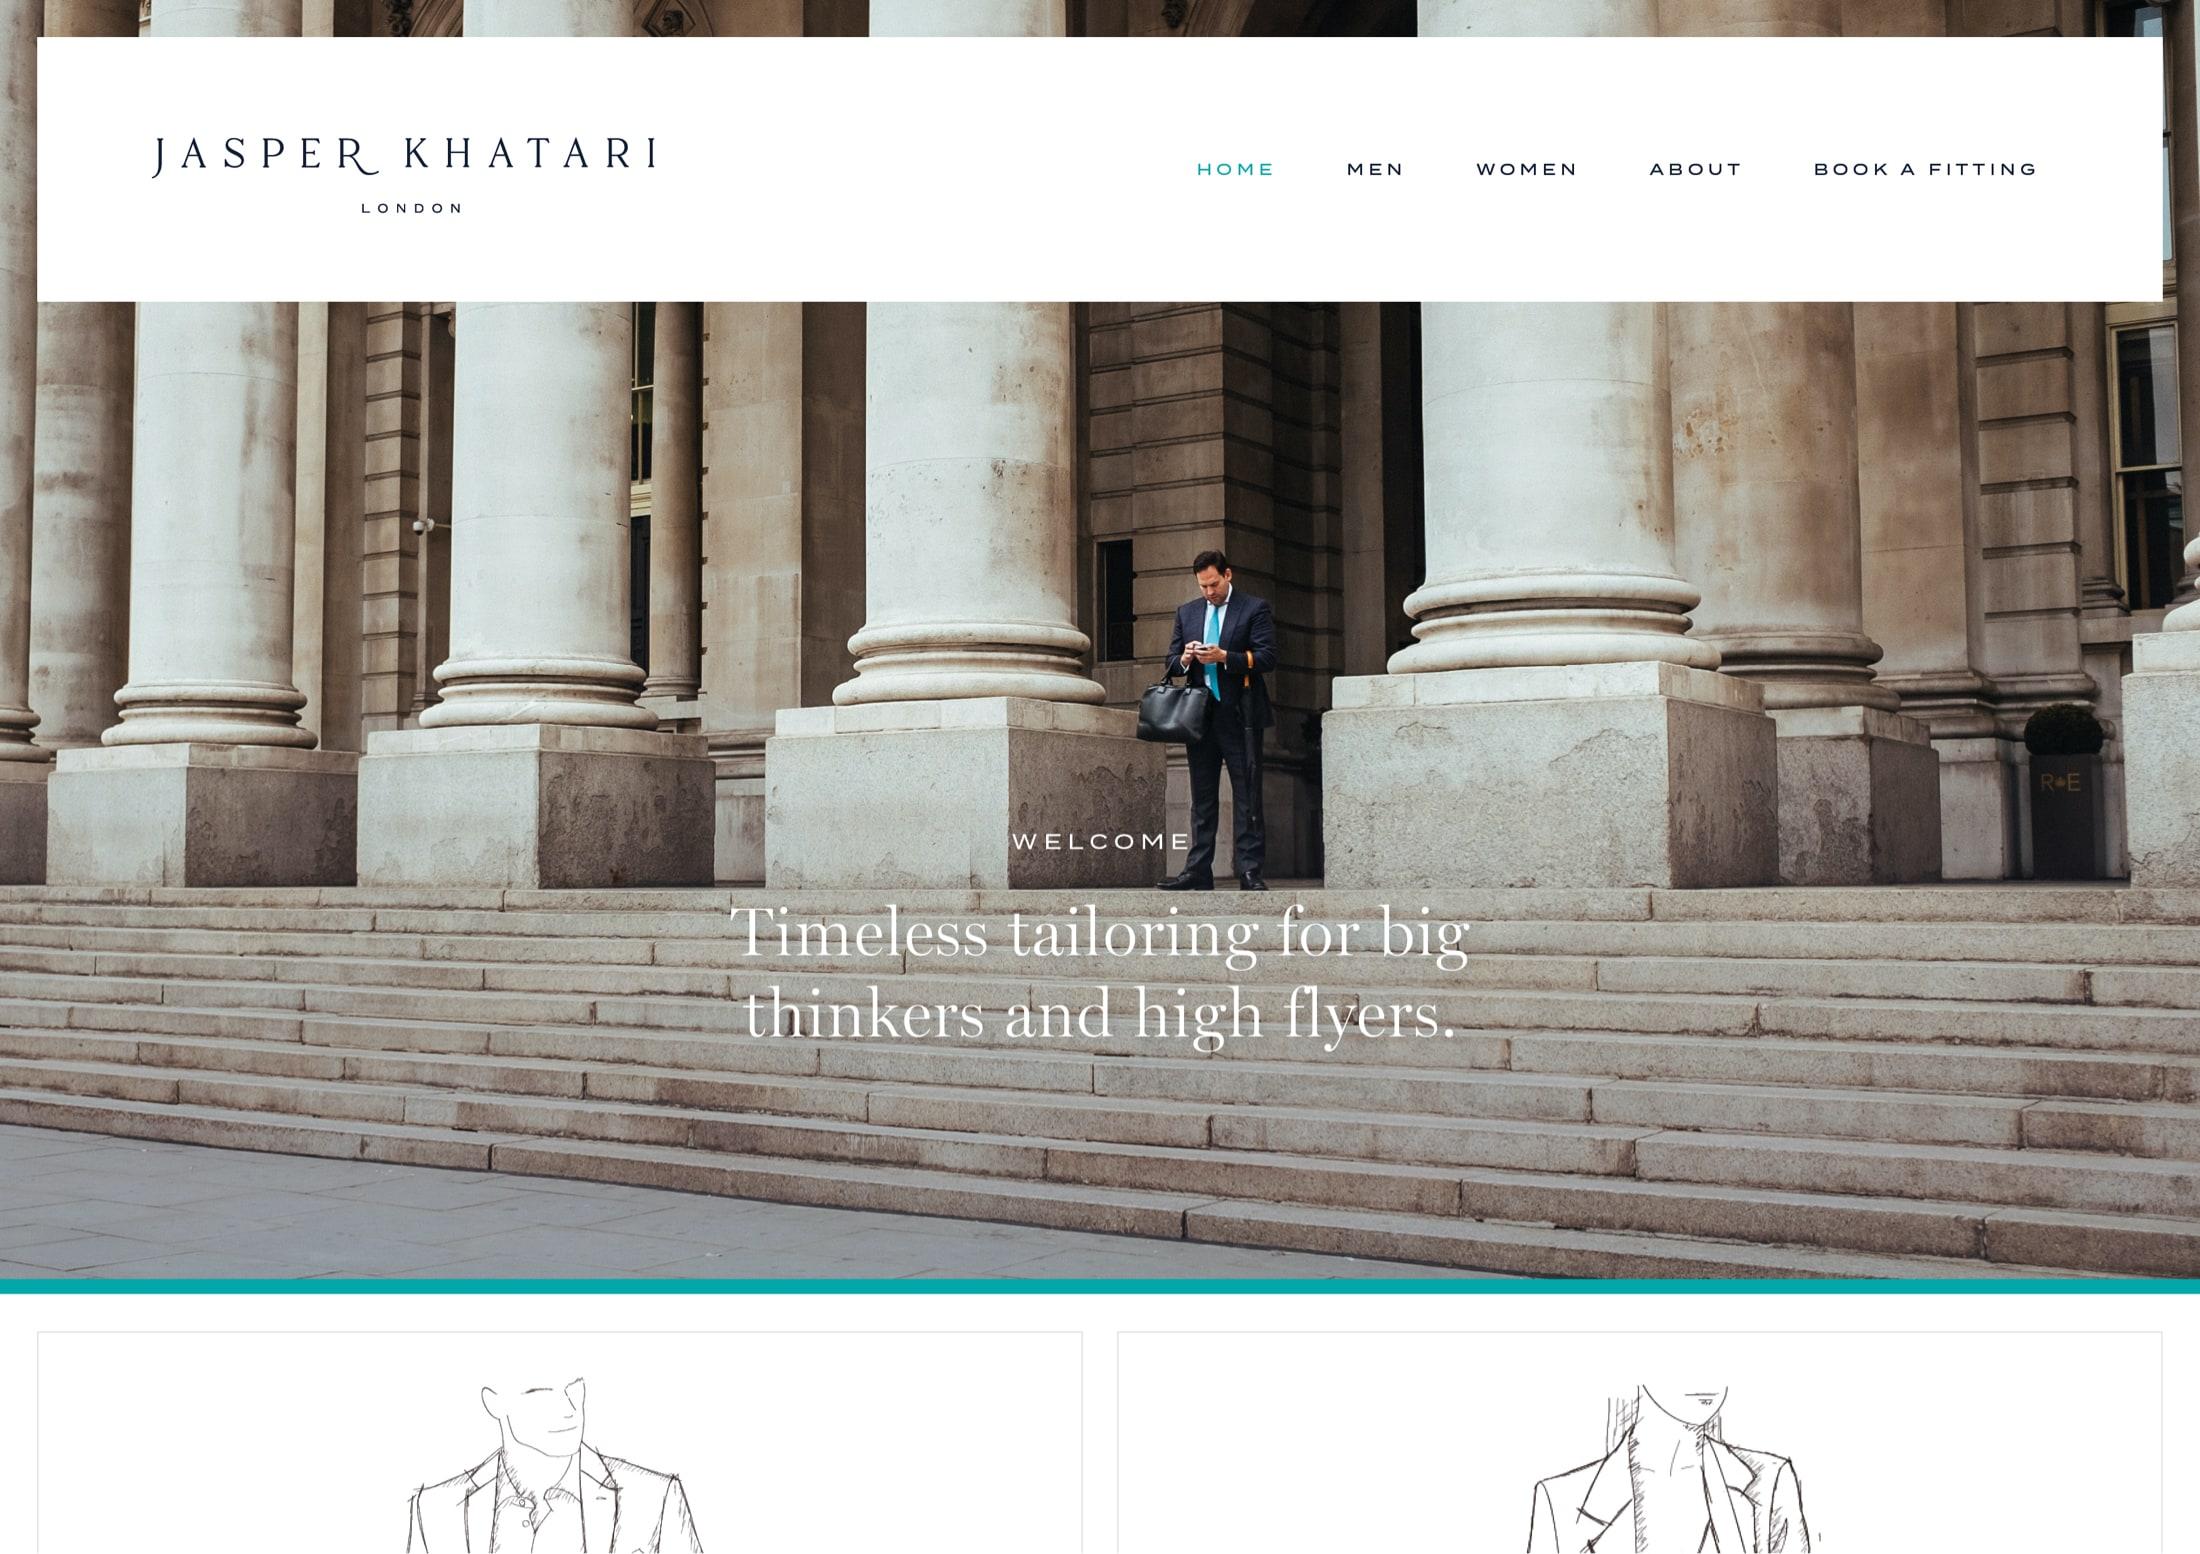 Website home page design for Savile Row tailor, Jasper Khatari